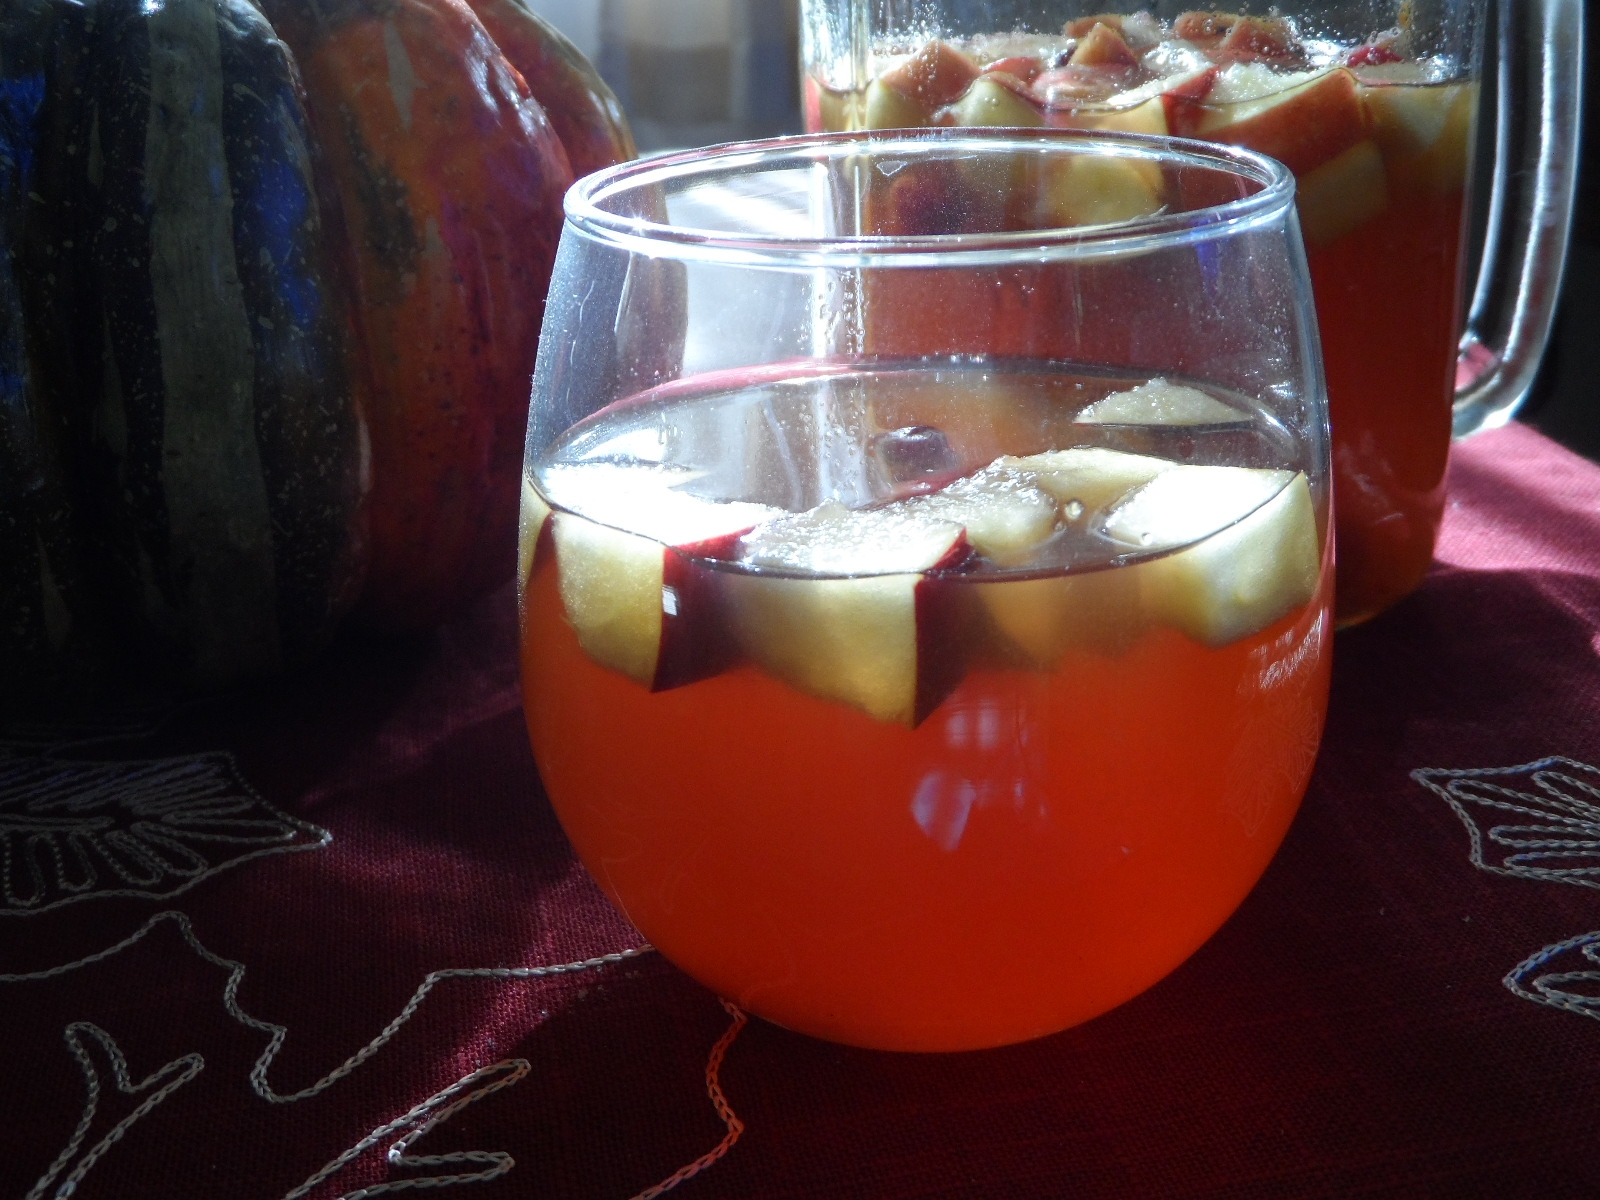 ... Pumpkin, Apple & Cranberry Sangria with Dark Spiced Rum (aka Kraken